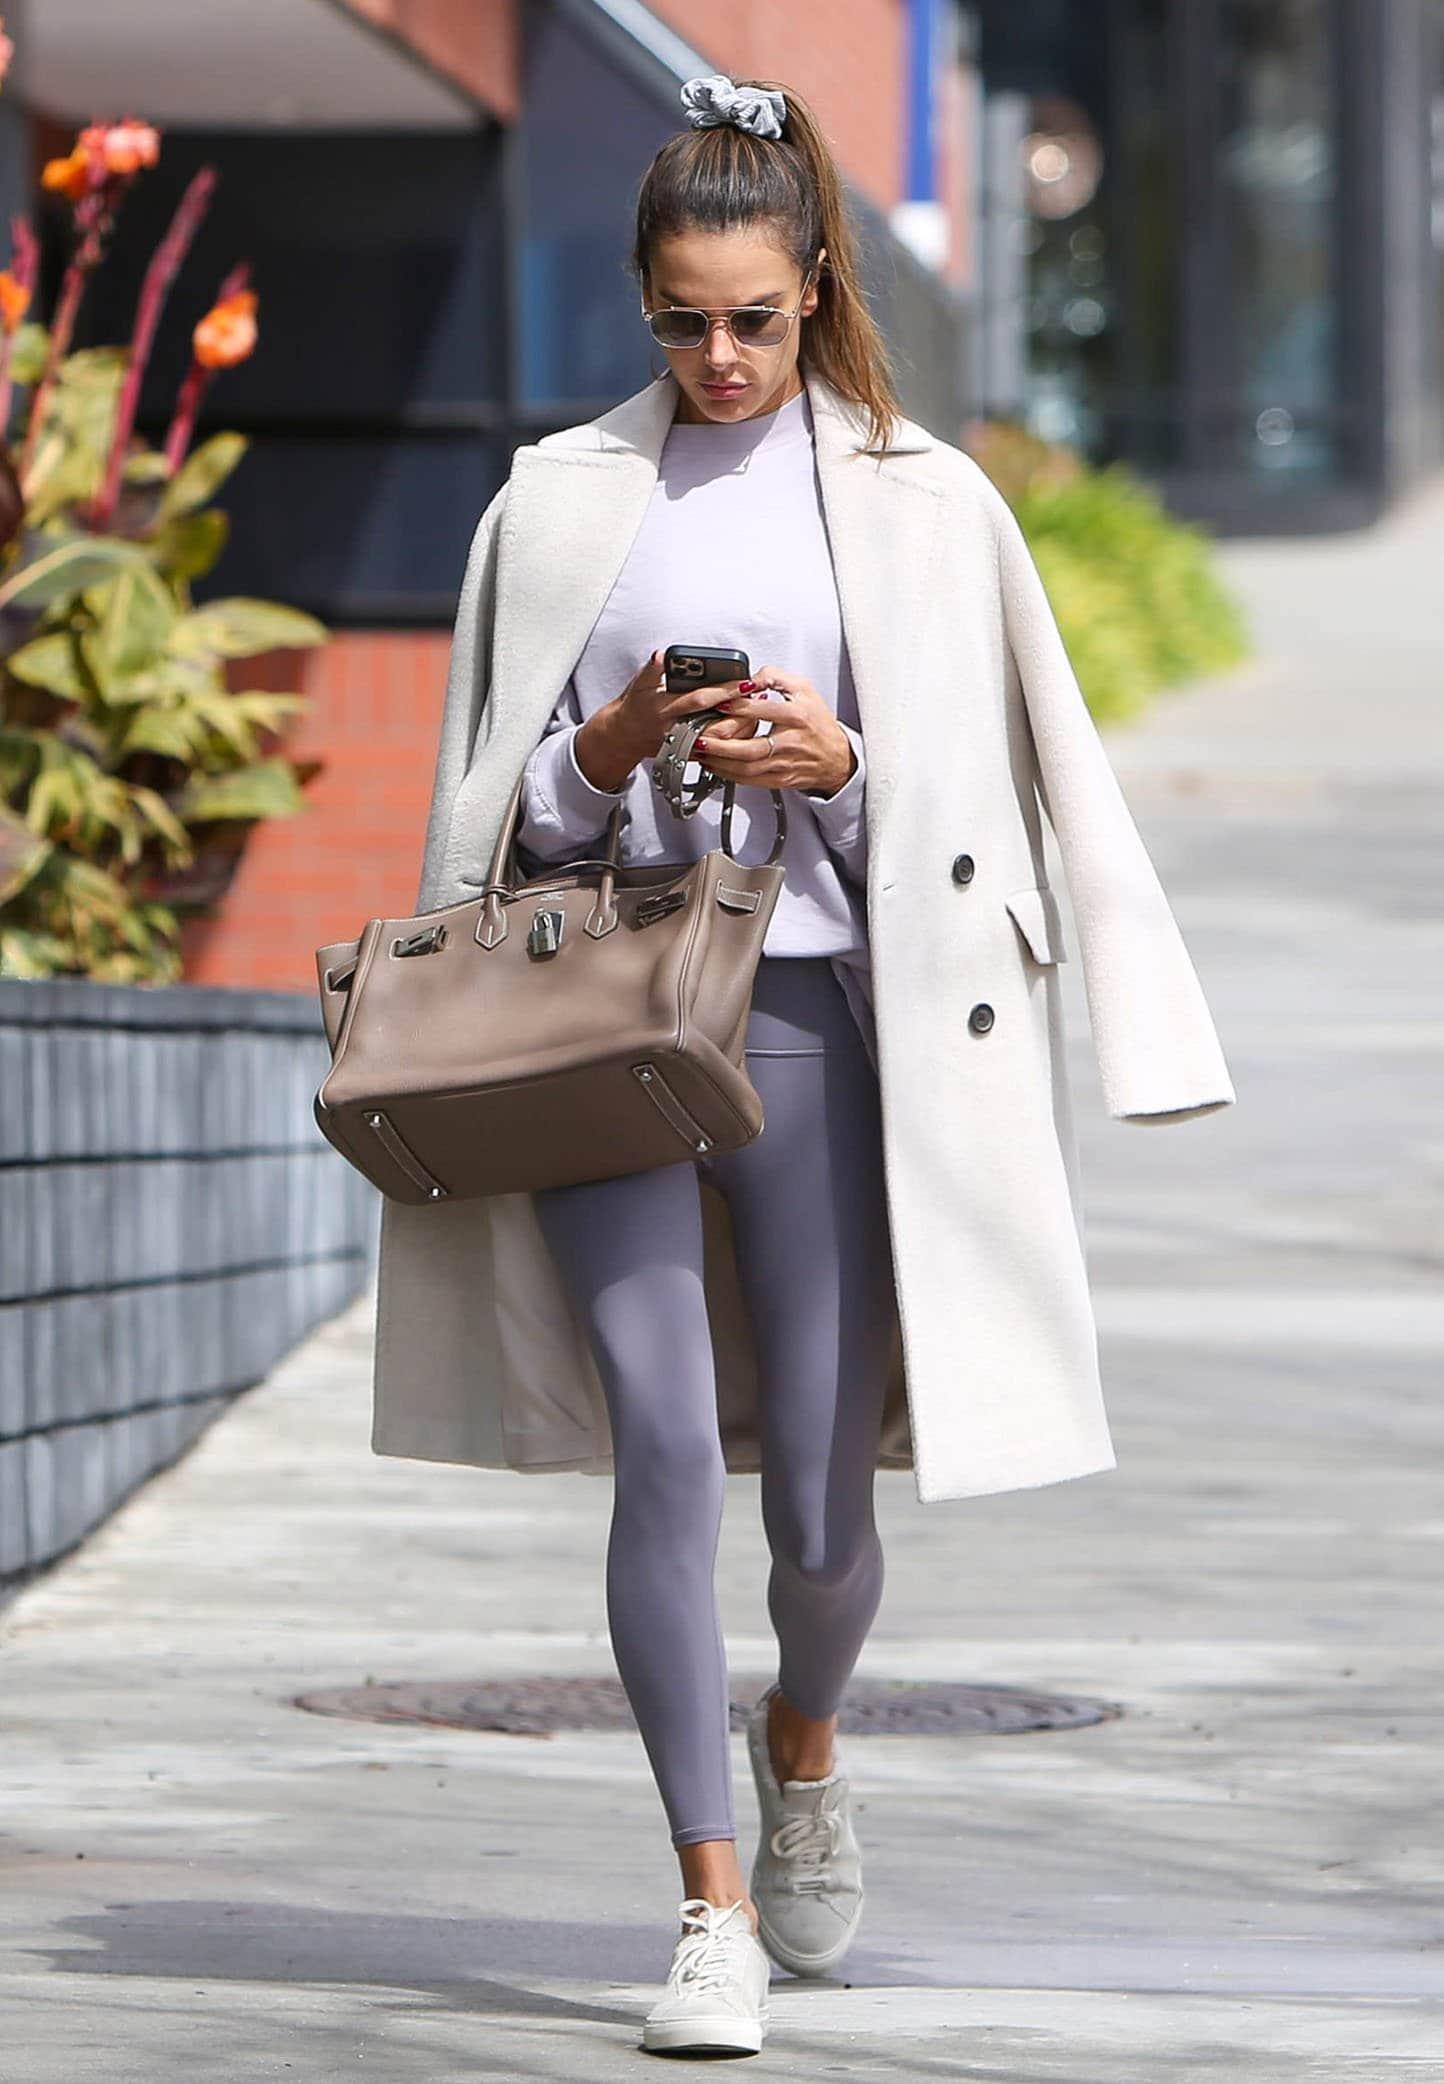 Alessandra Ambrosio wears Alo Yoga purple leggings and matching sweatshirt with a white coat